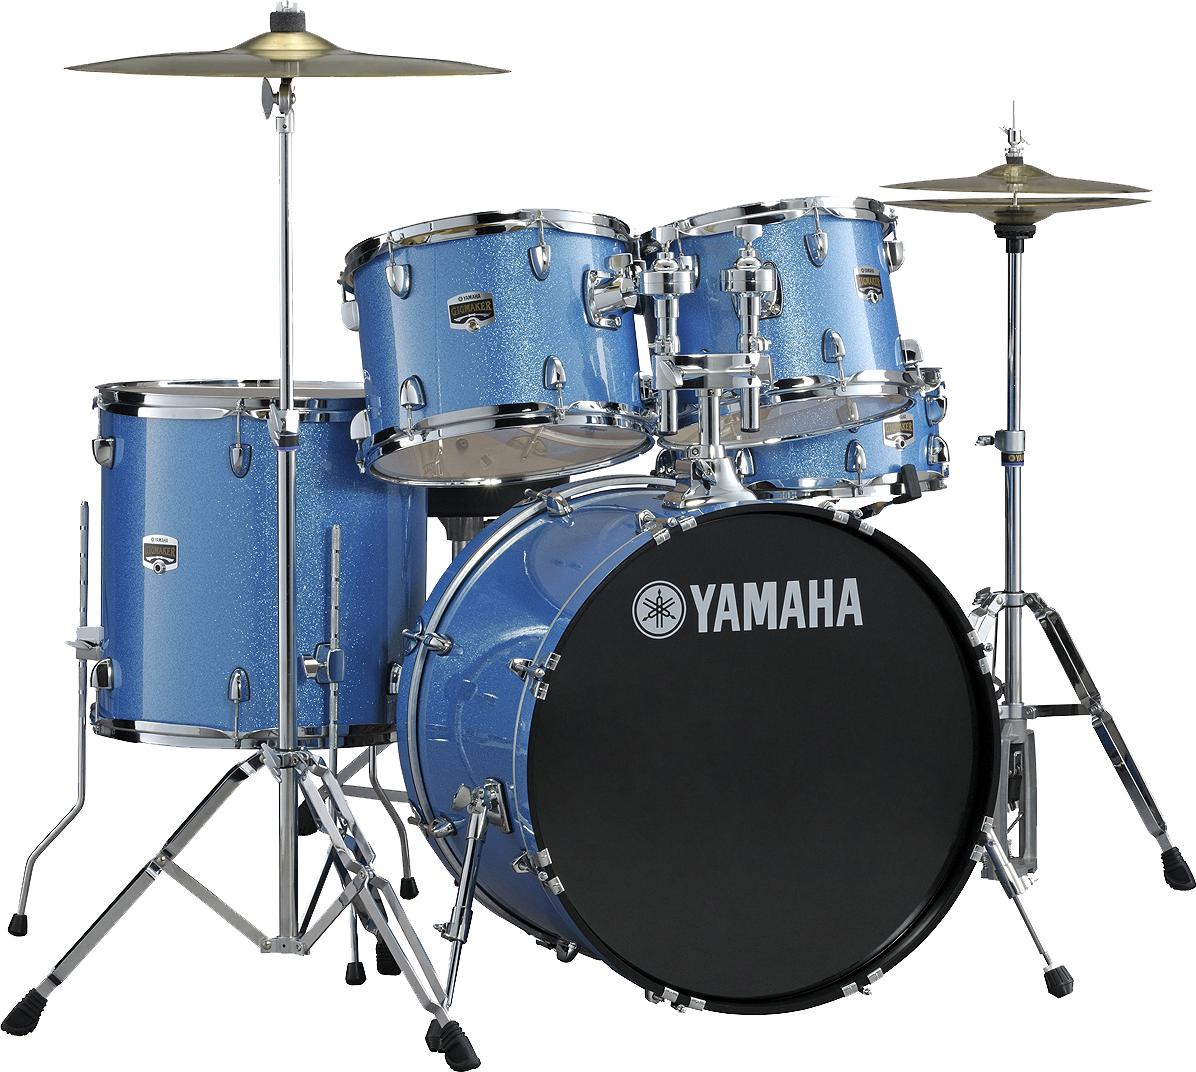 Drums clipart transparent background. Yamaha kit png image